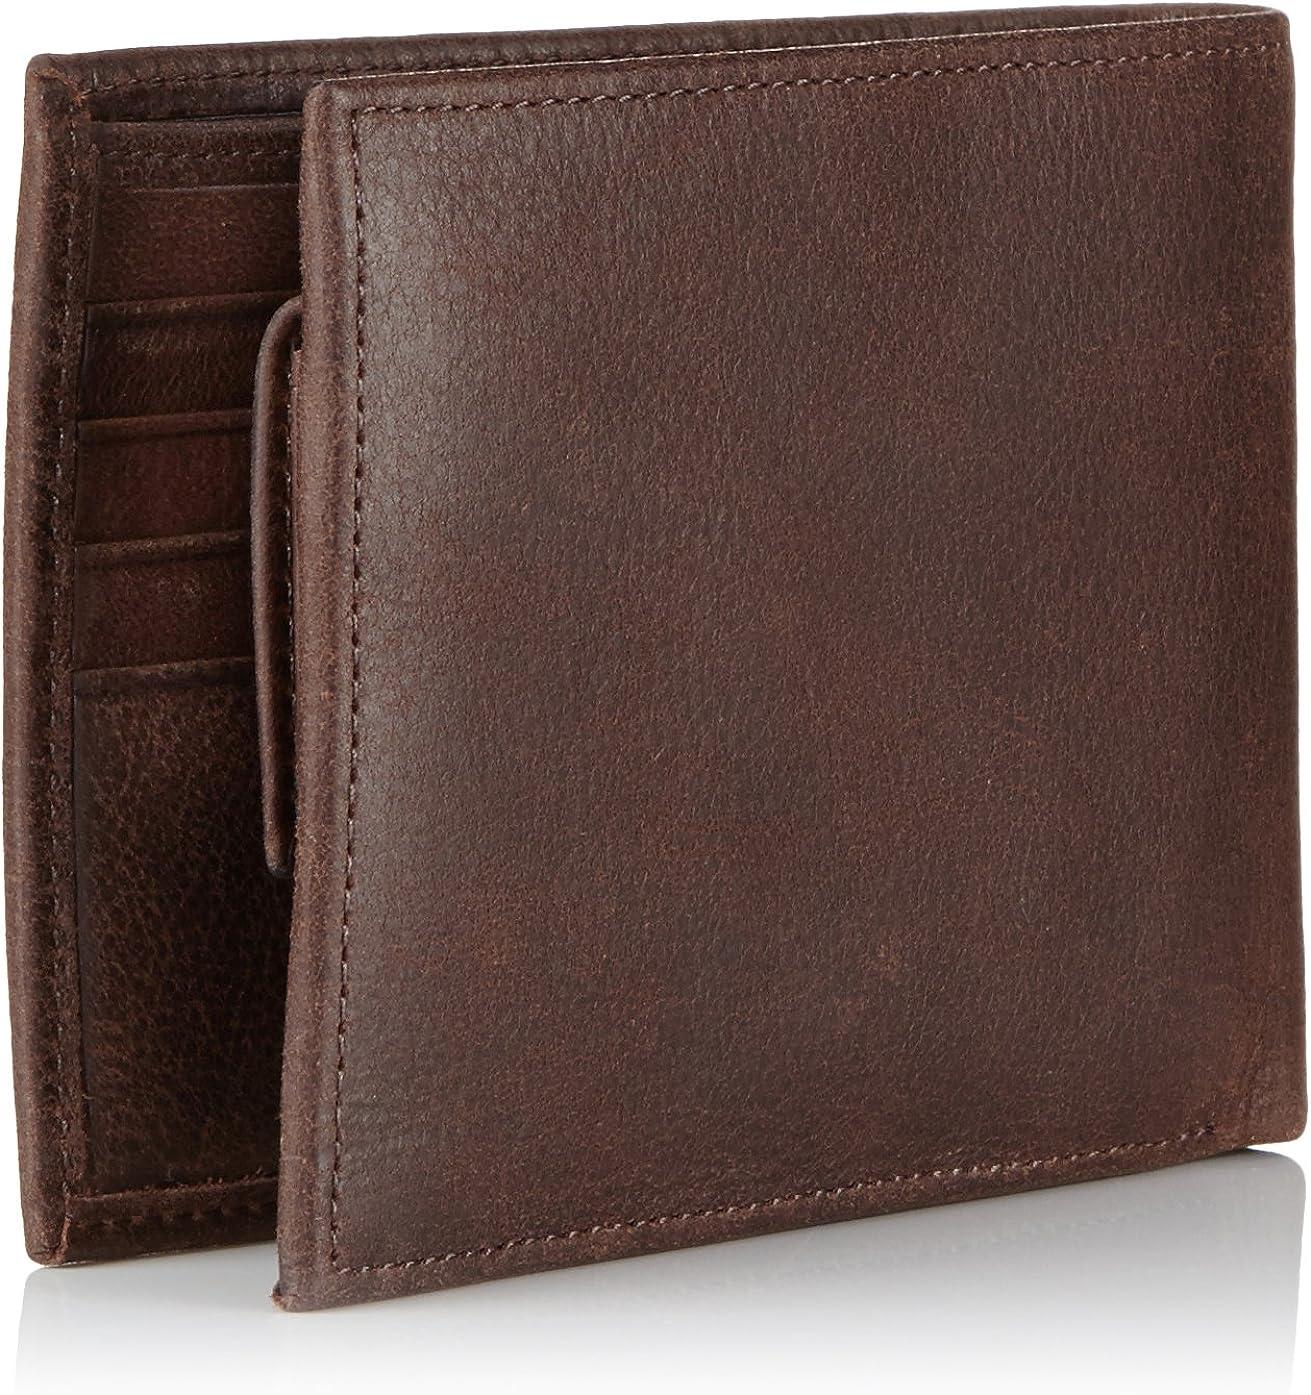 Porte-Monnaie Tommy Hilfiger Johnson Bm56927577